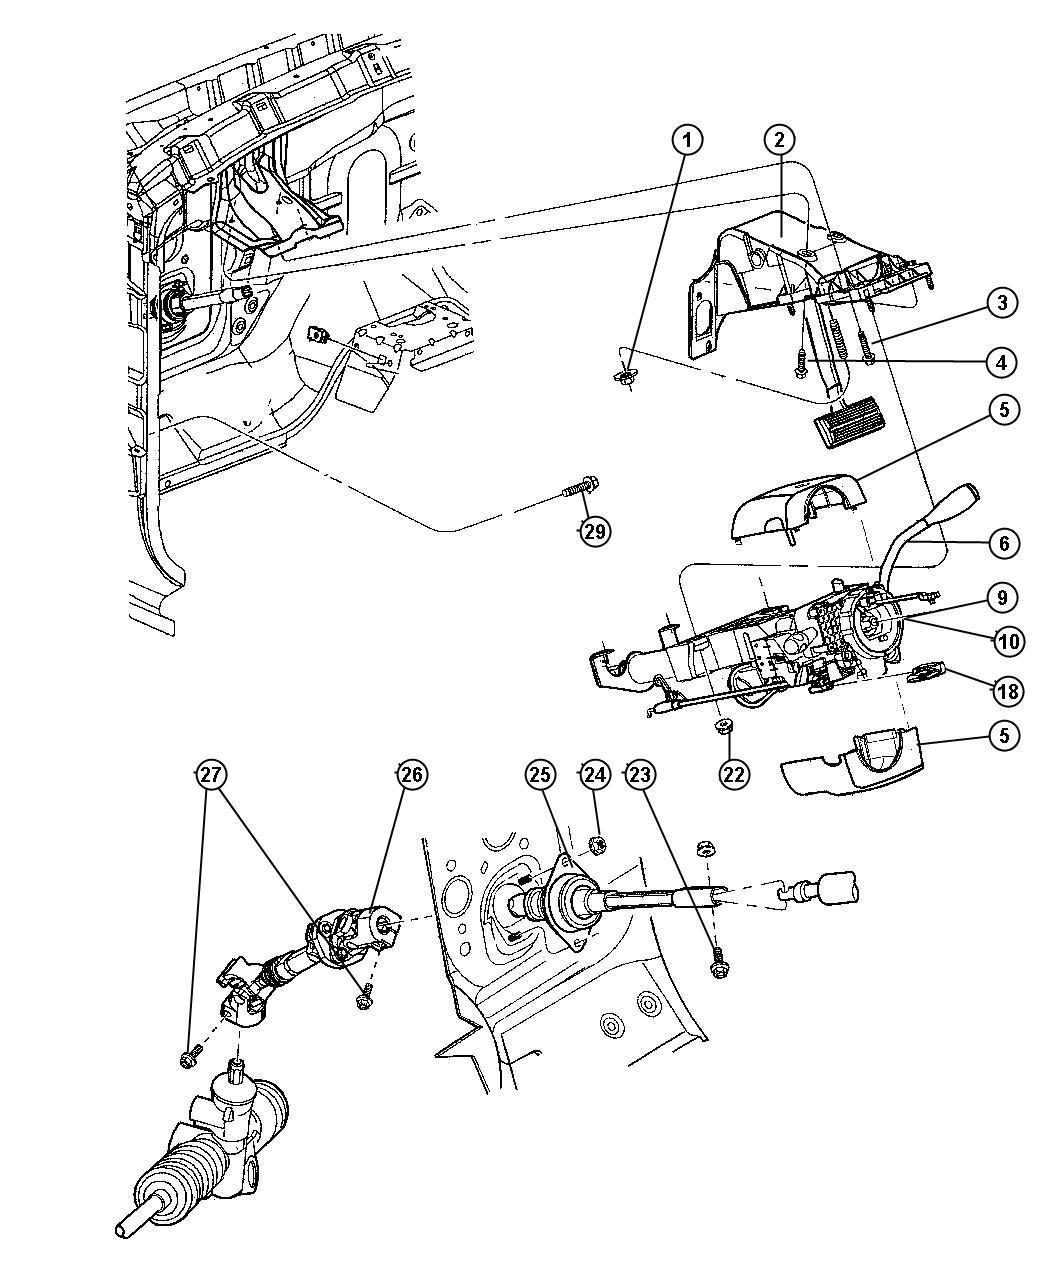 Dodge Dakota Bracket Steering Column Used For Clutch